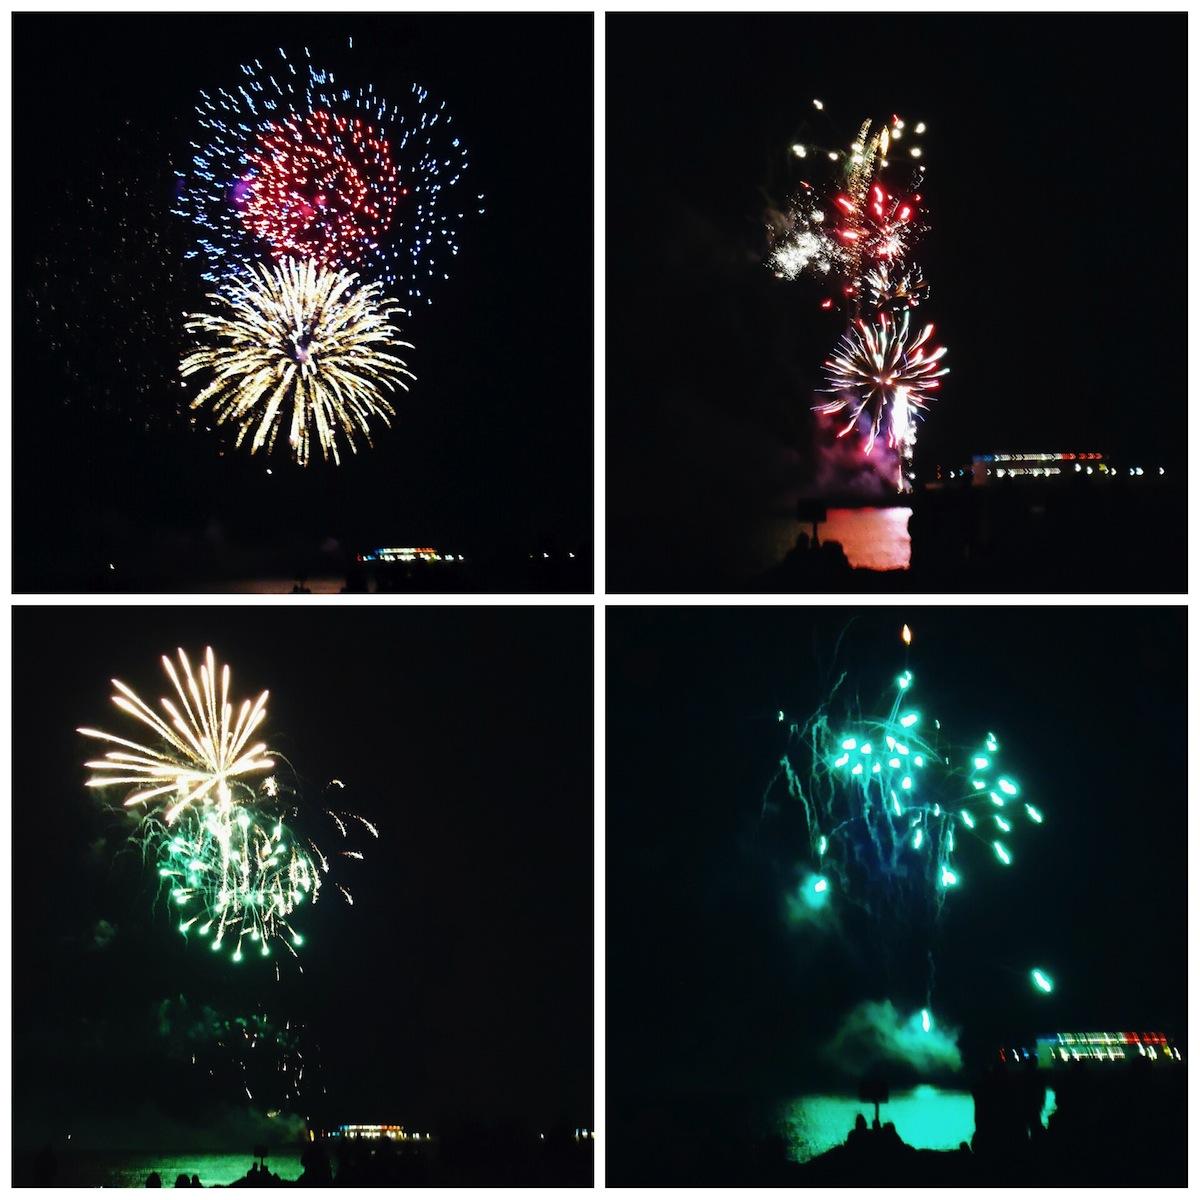 Bonfire Night fireworks, Worthing